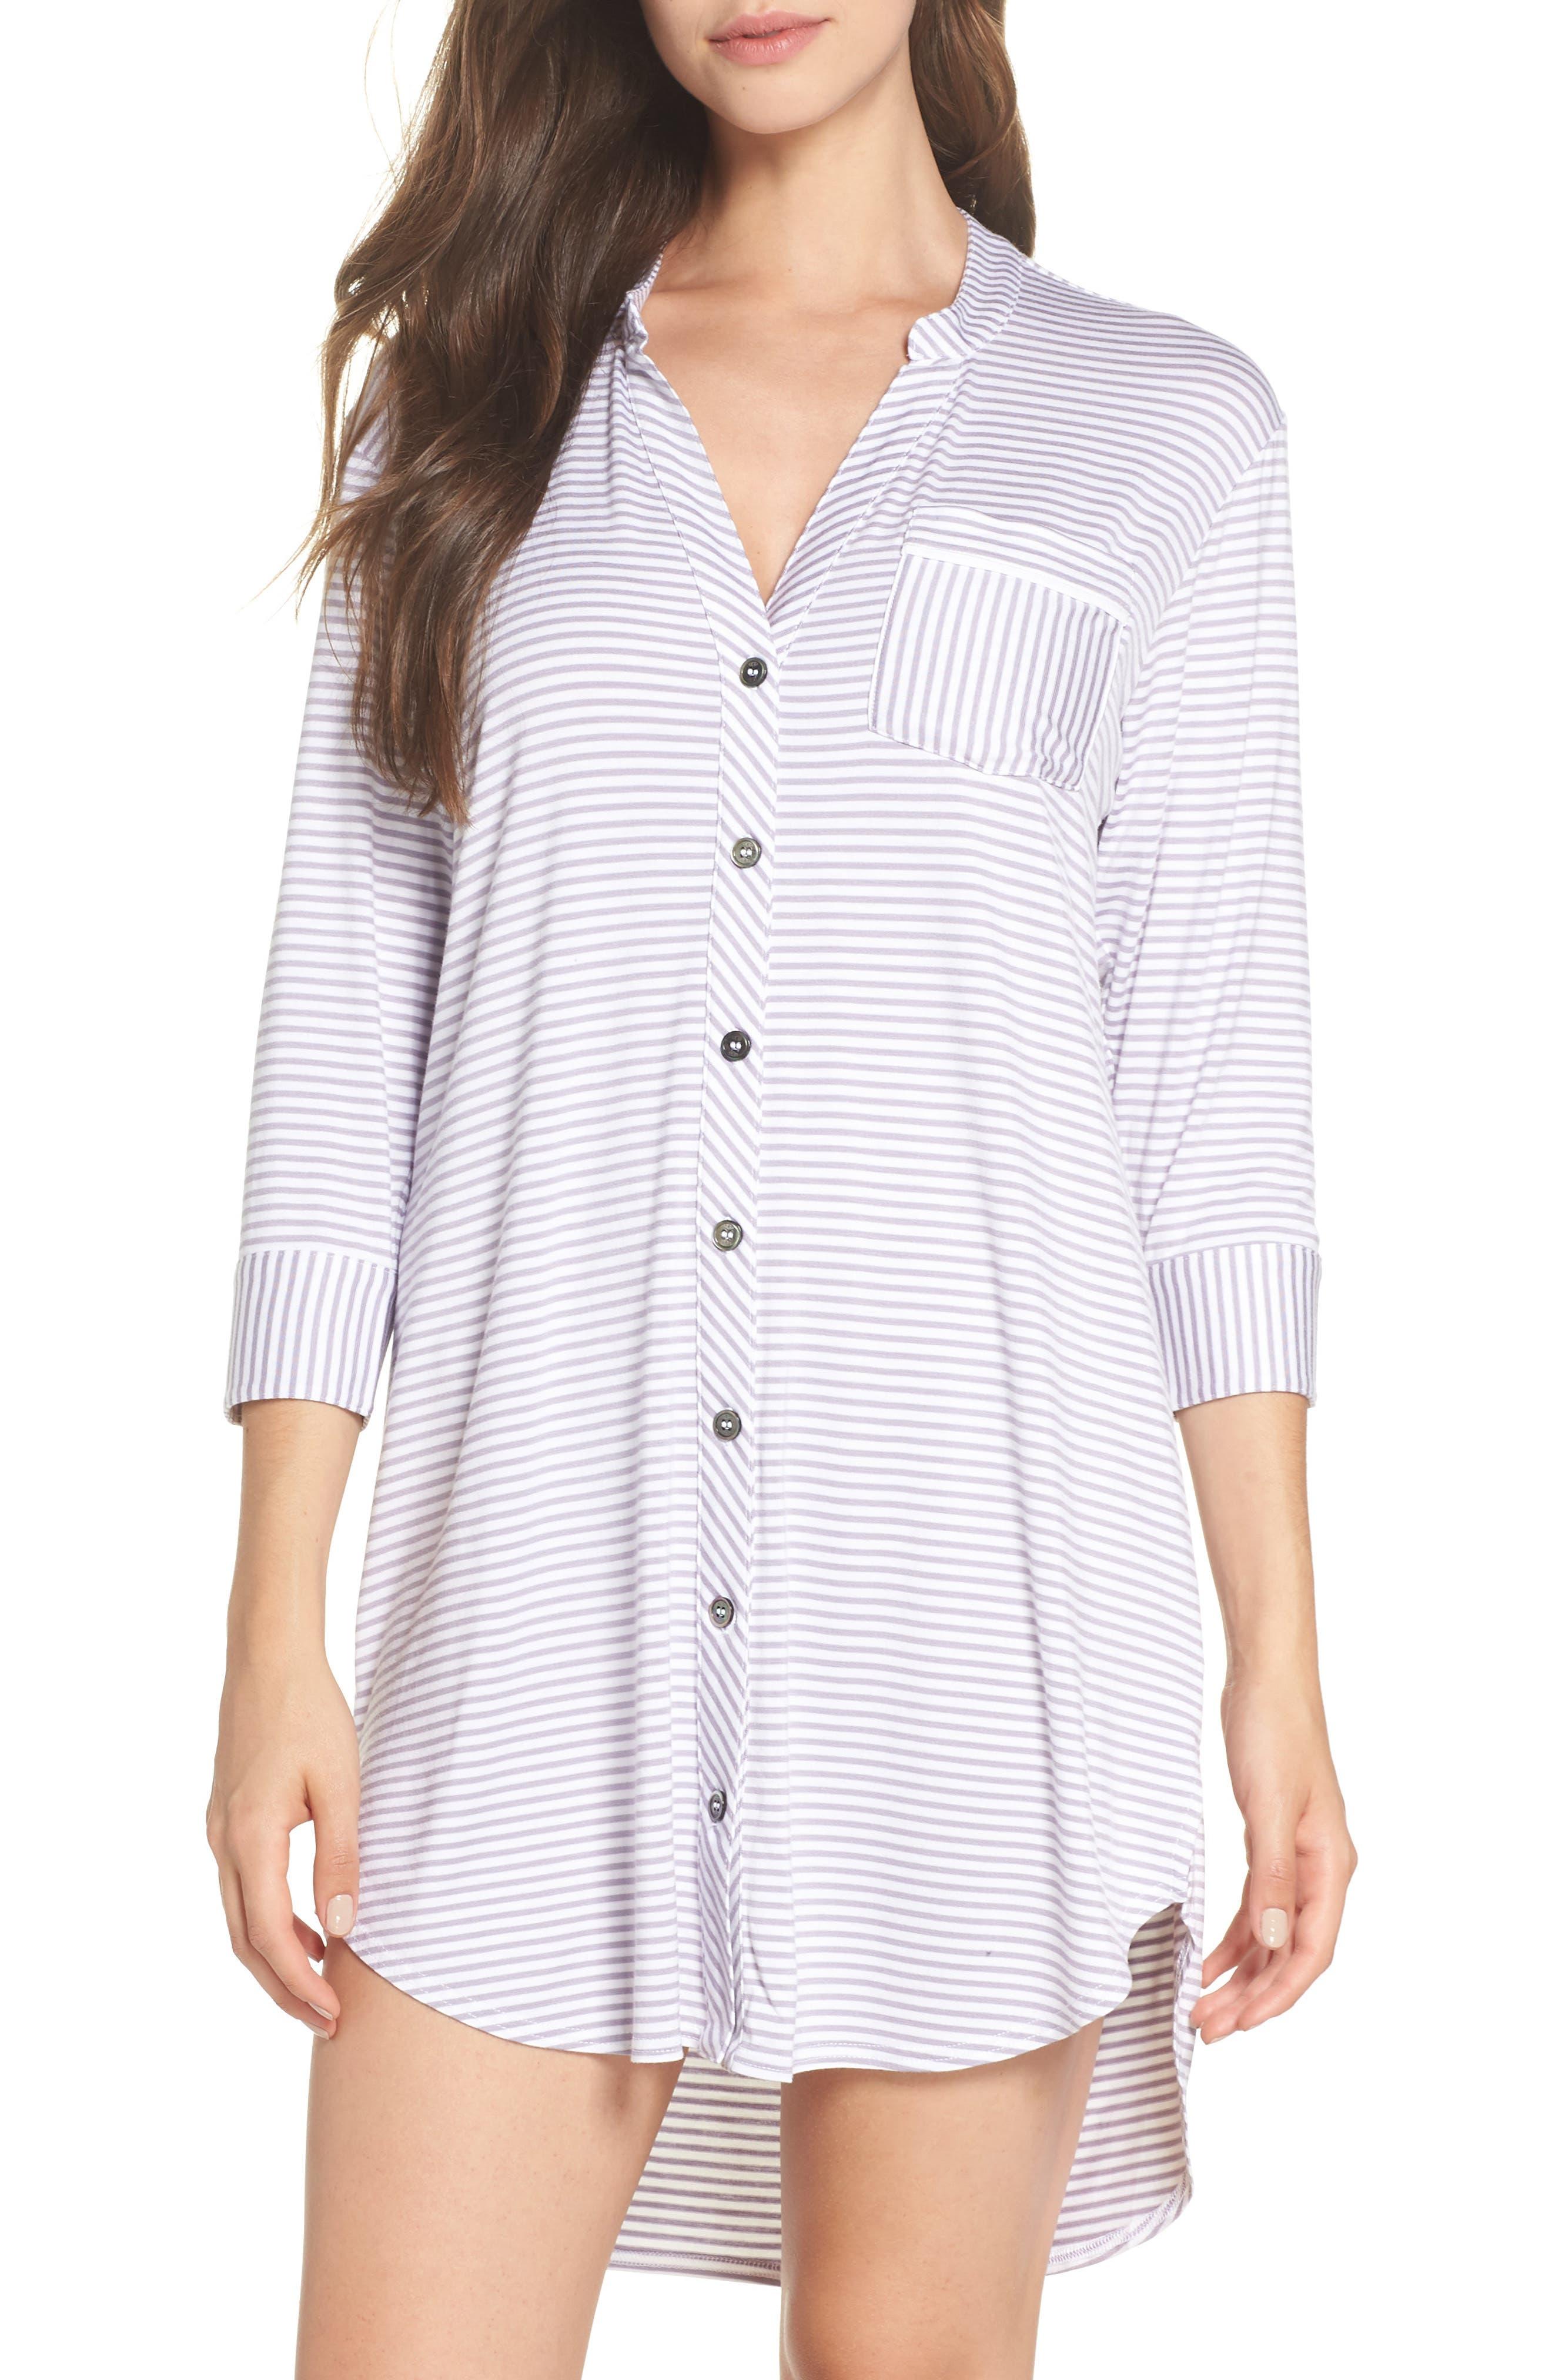 Vivian Sleep Shirt,                         Main,                         color, LAVENDER AURA / WHITE STRIPE